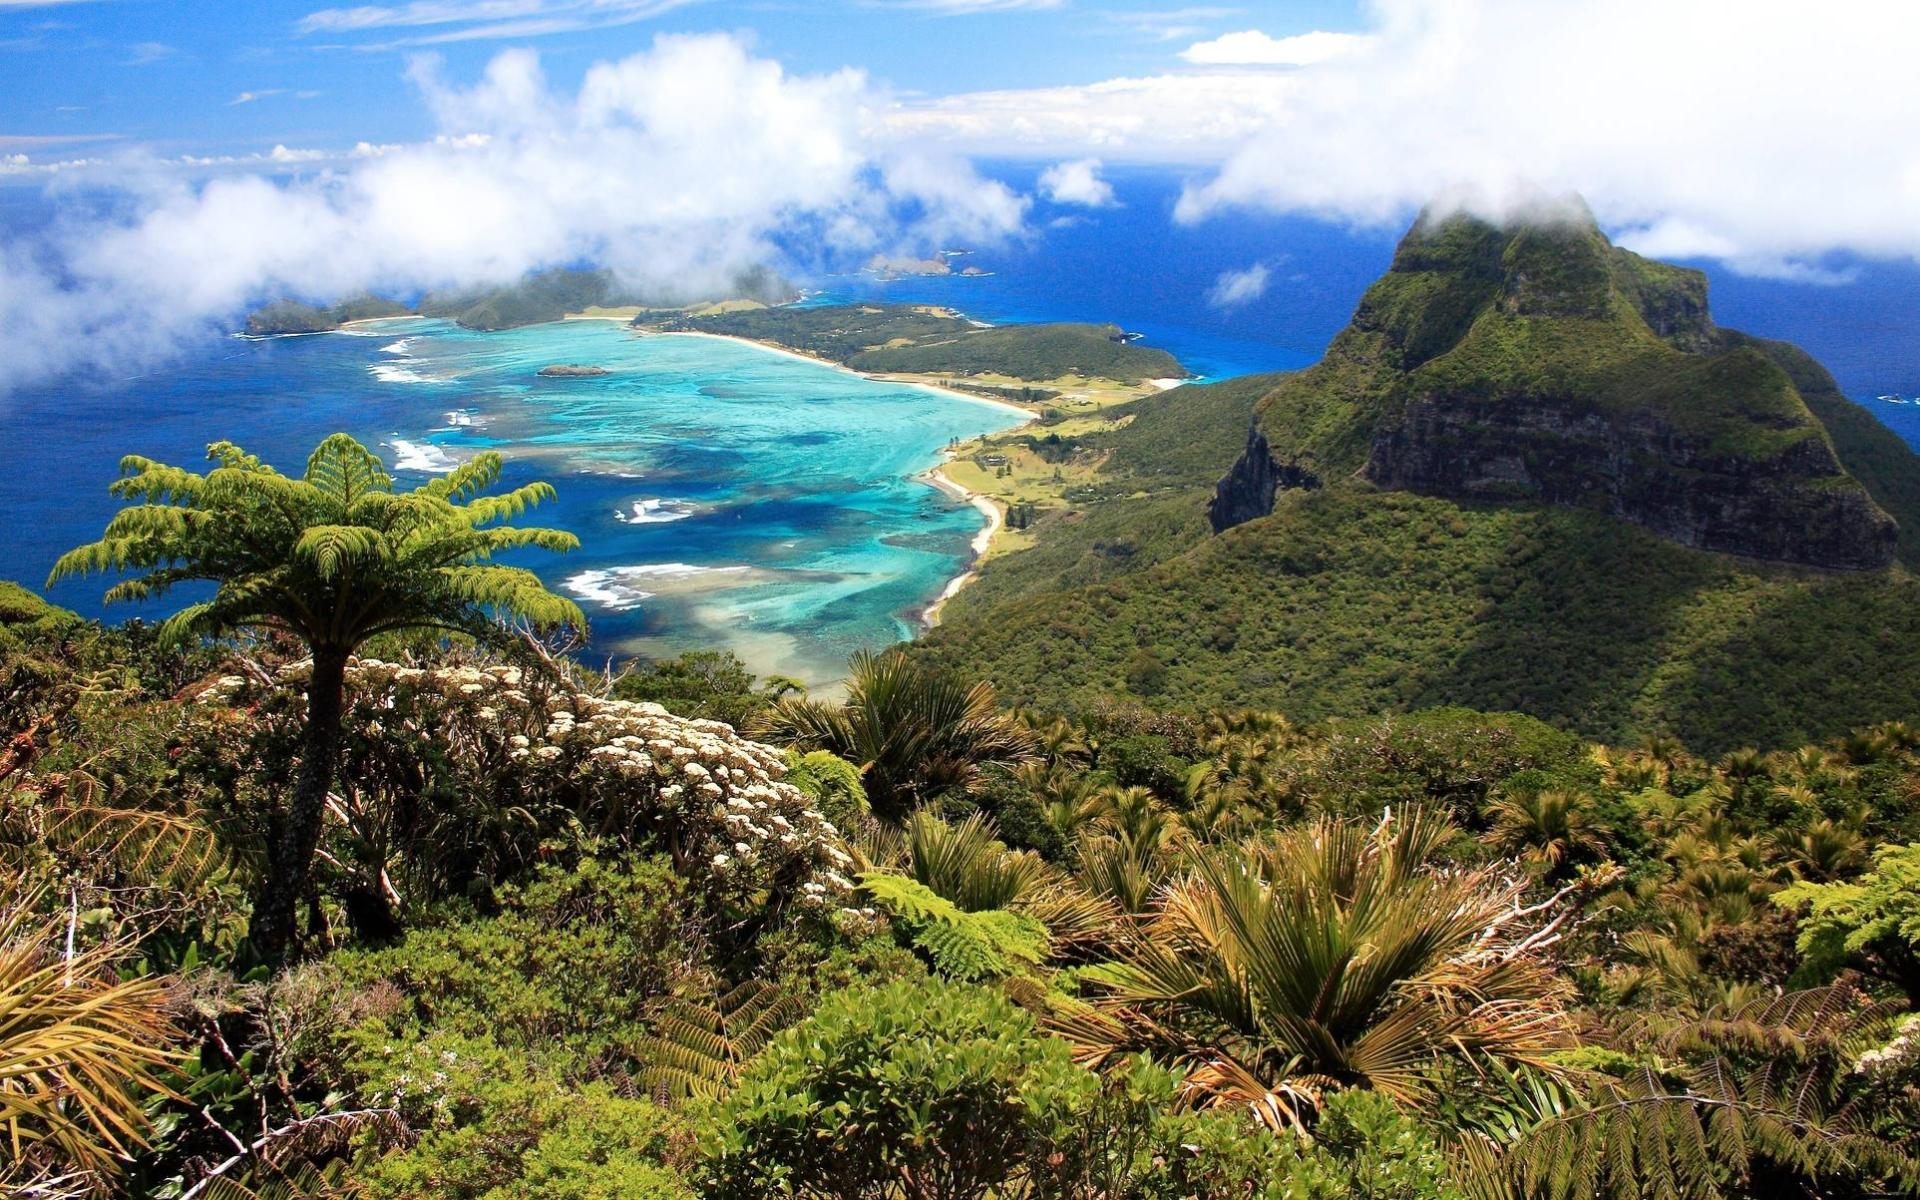 Island of haka